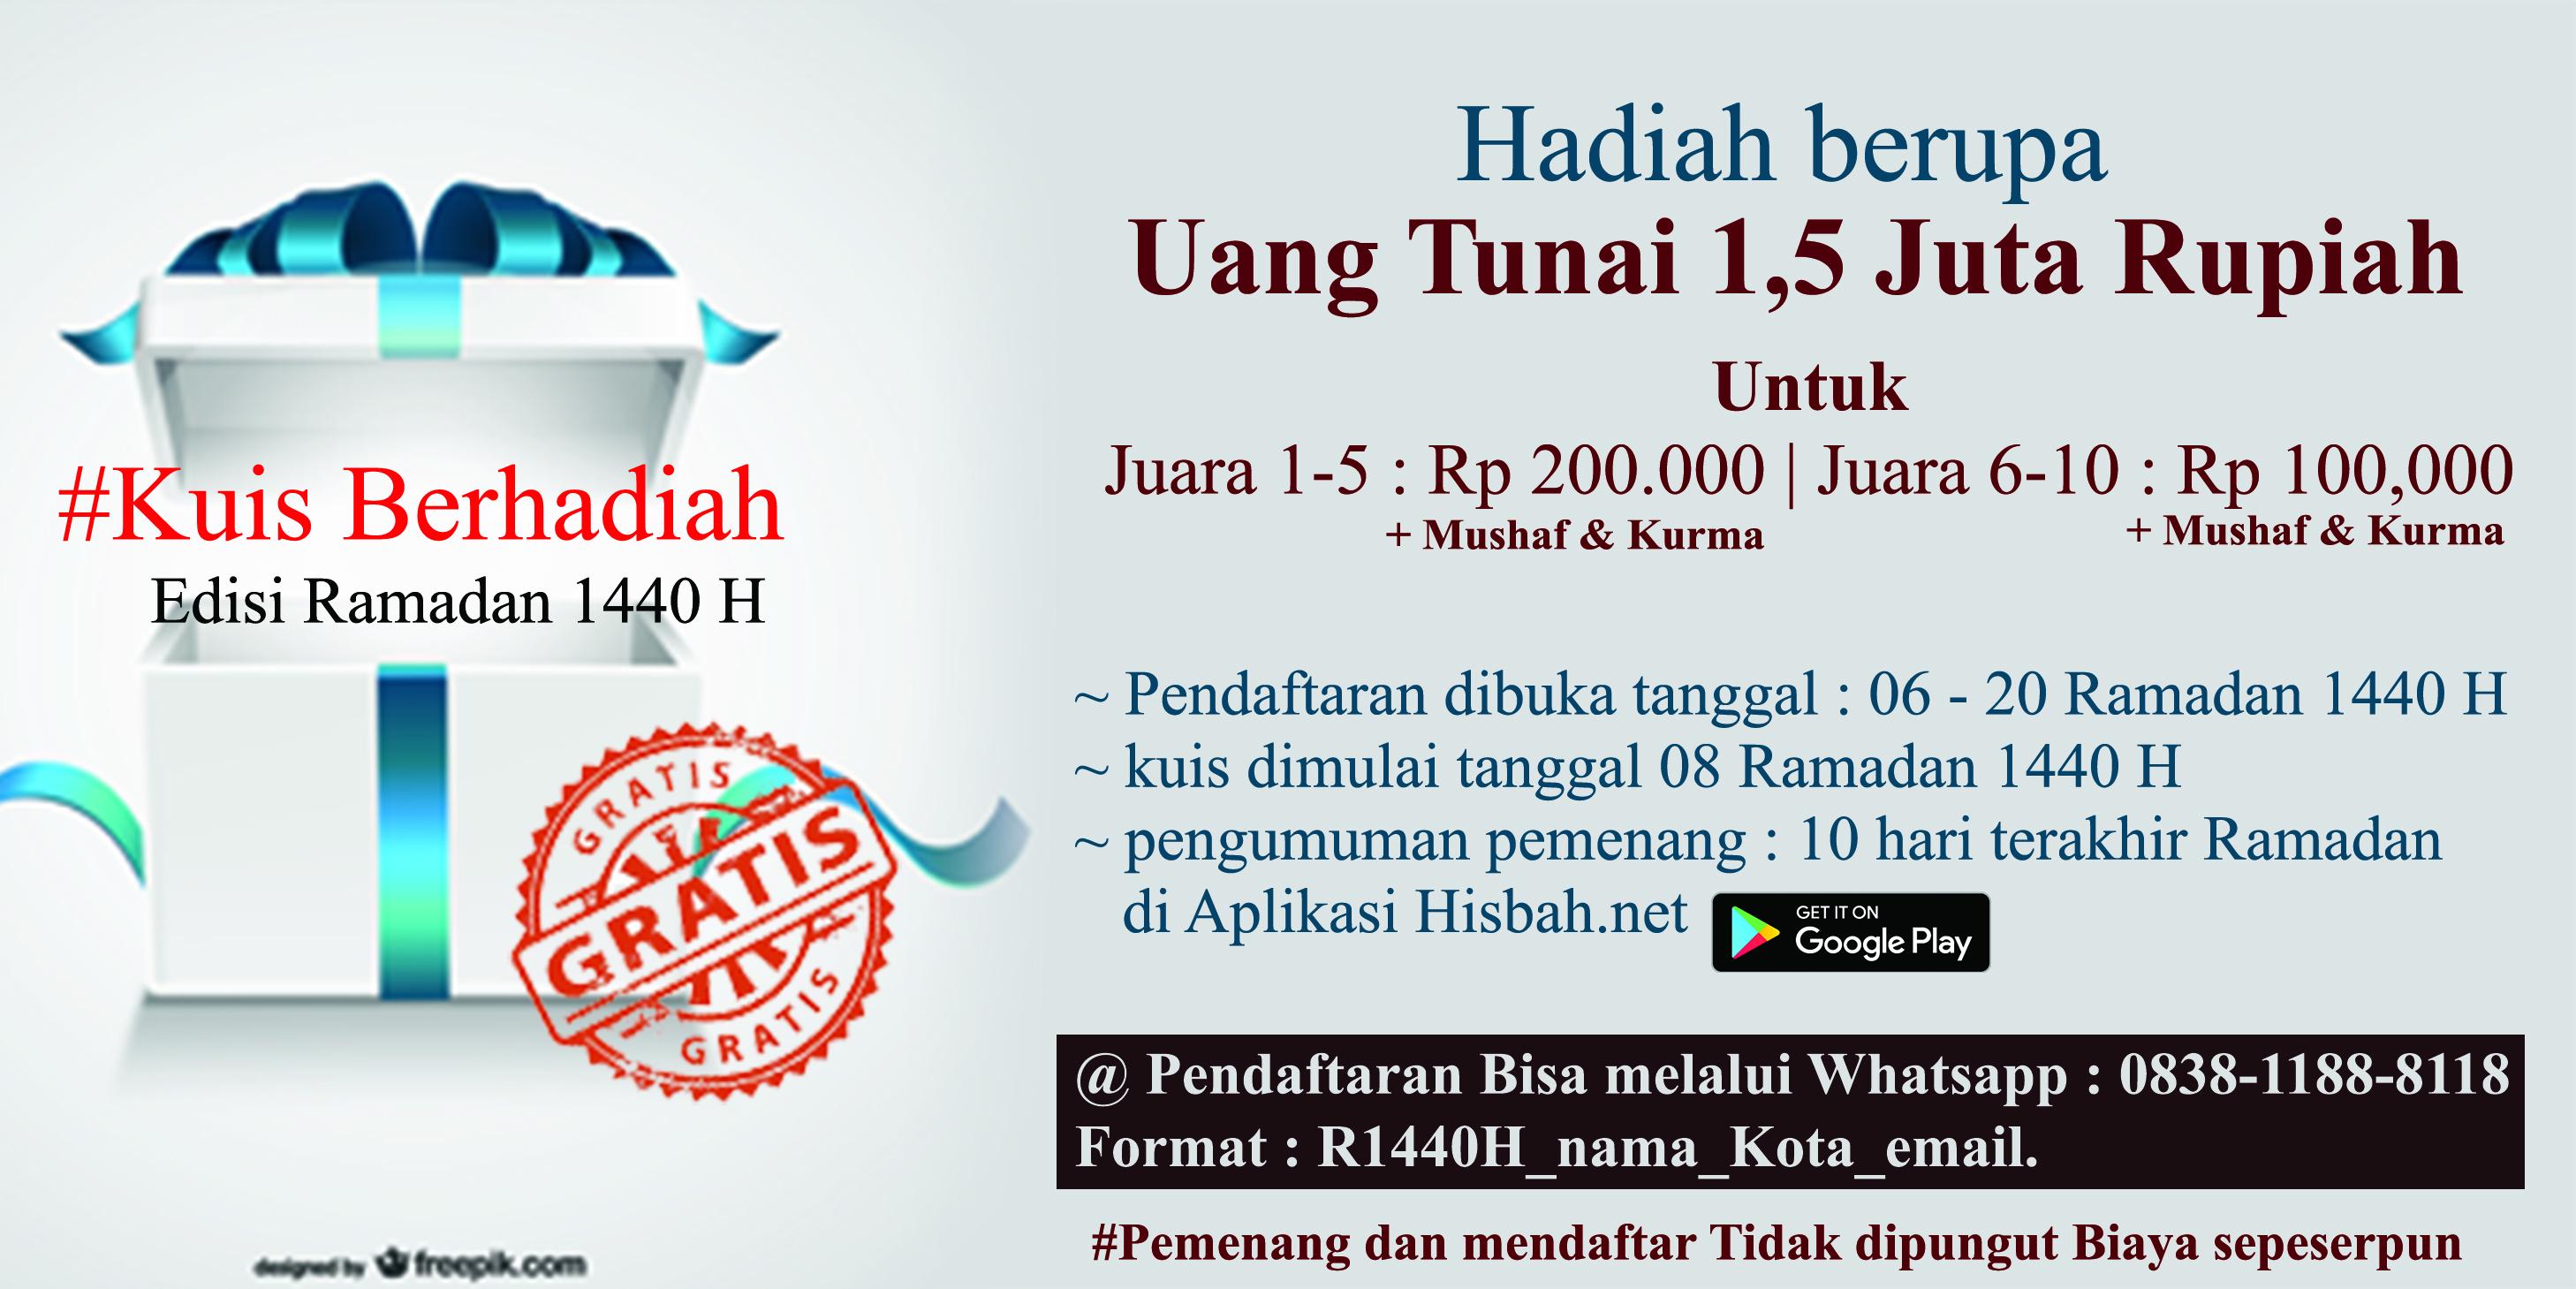 kuis-edisi-ramadan-1440h.jpg